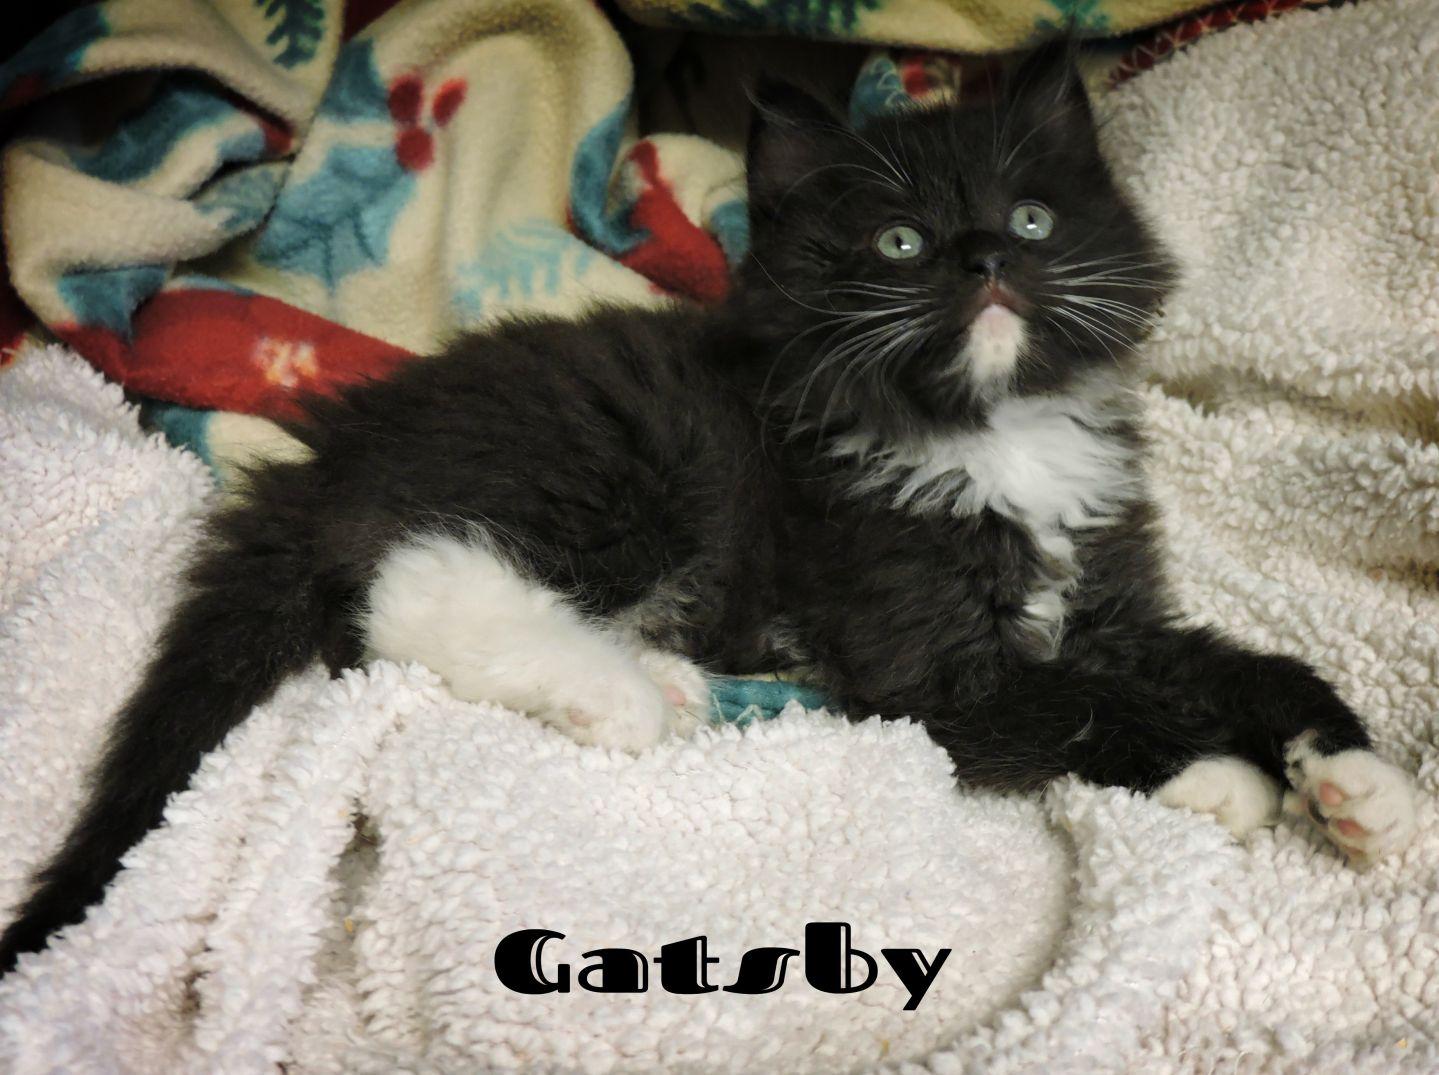 Gatsby -